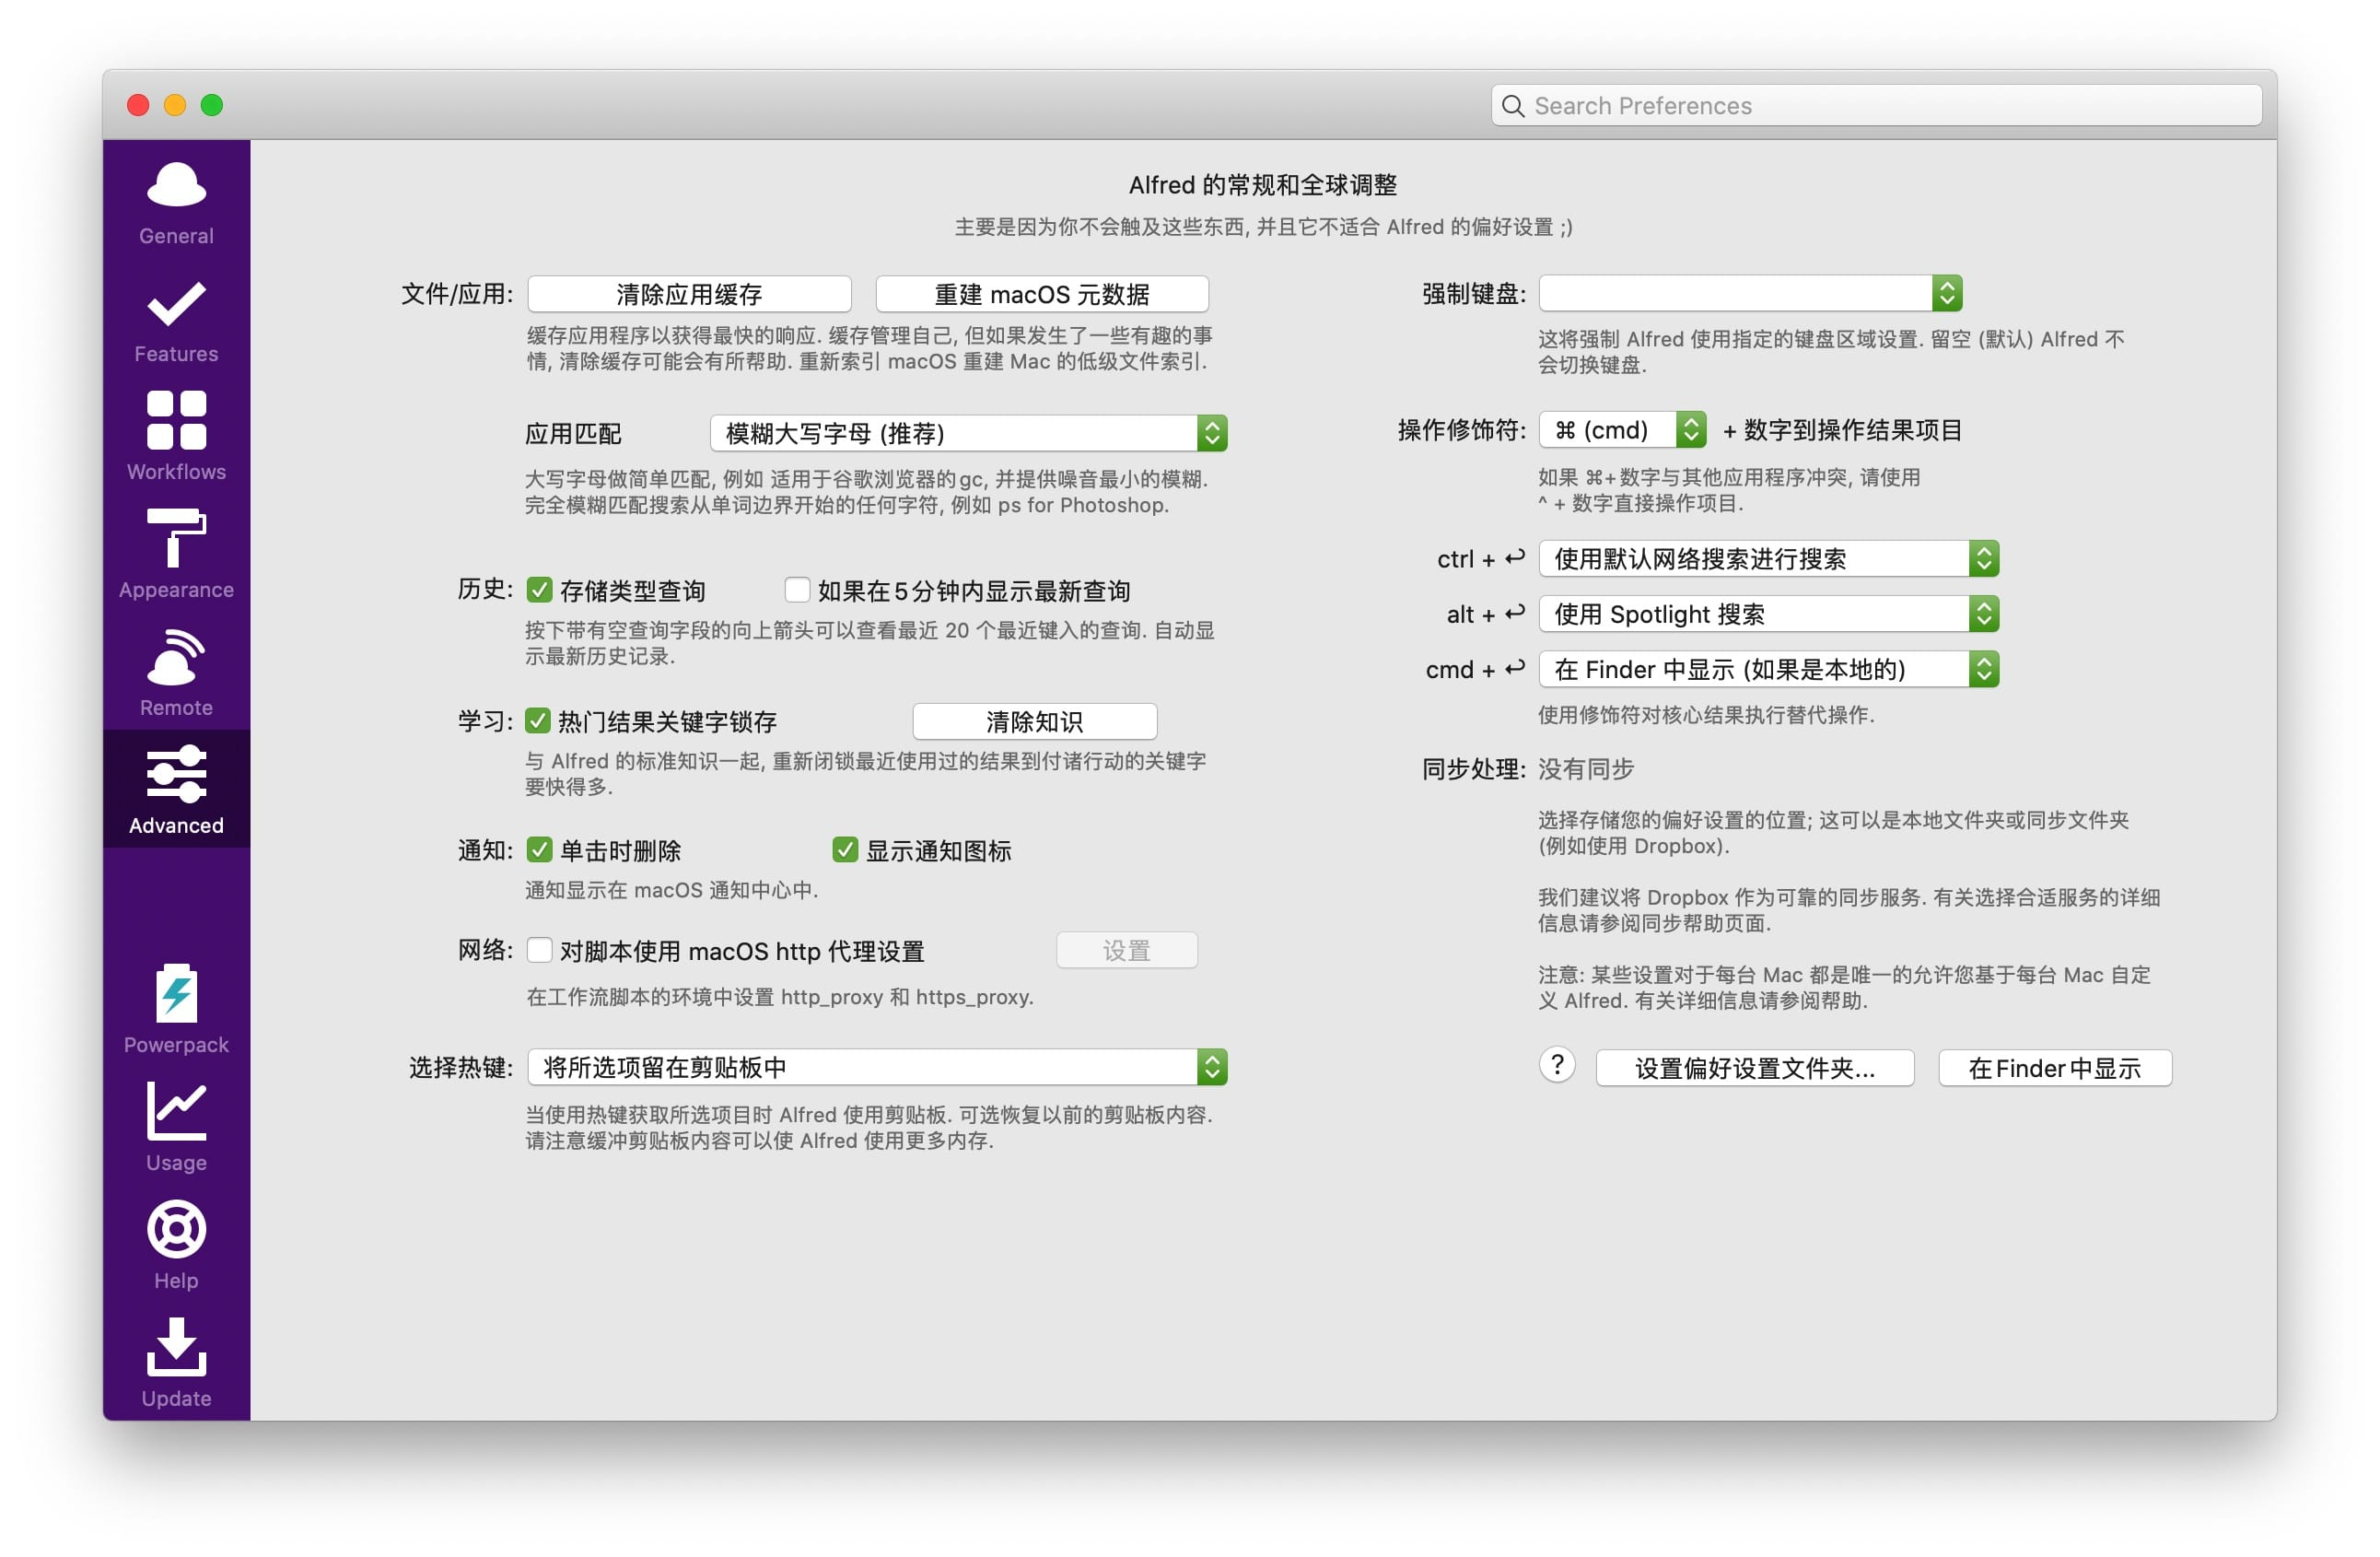 Alfred 4.0.8 (1133) 中文版 Mac效率神器-Mac毒